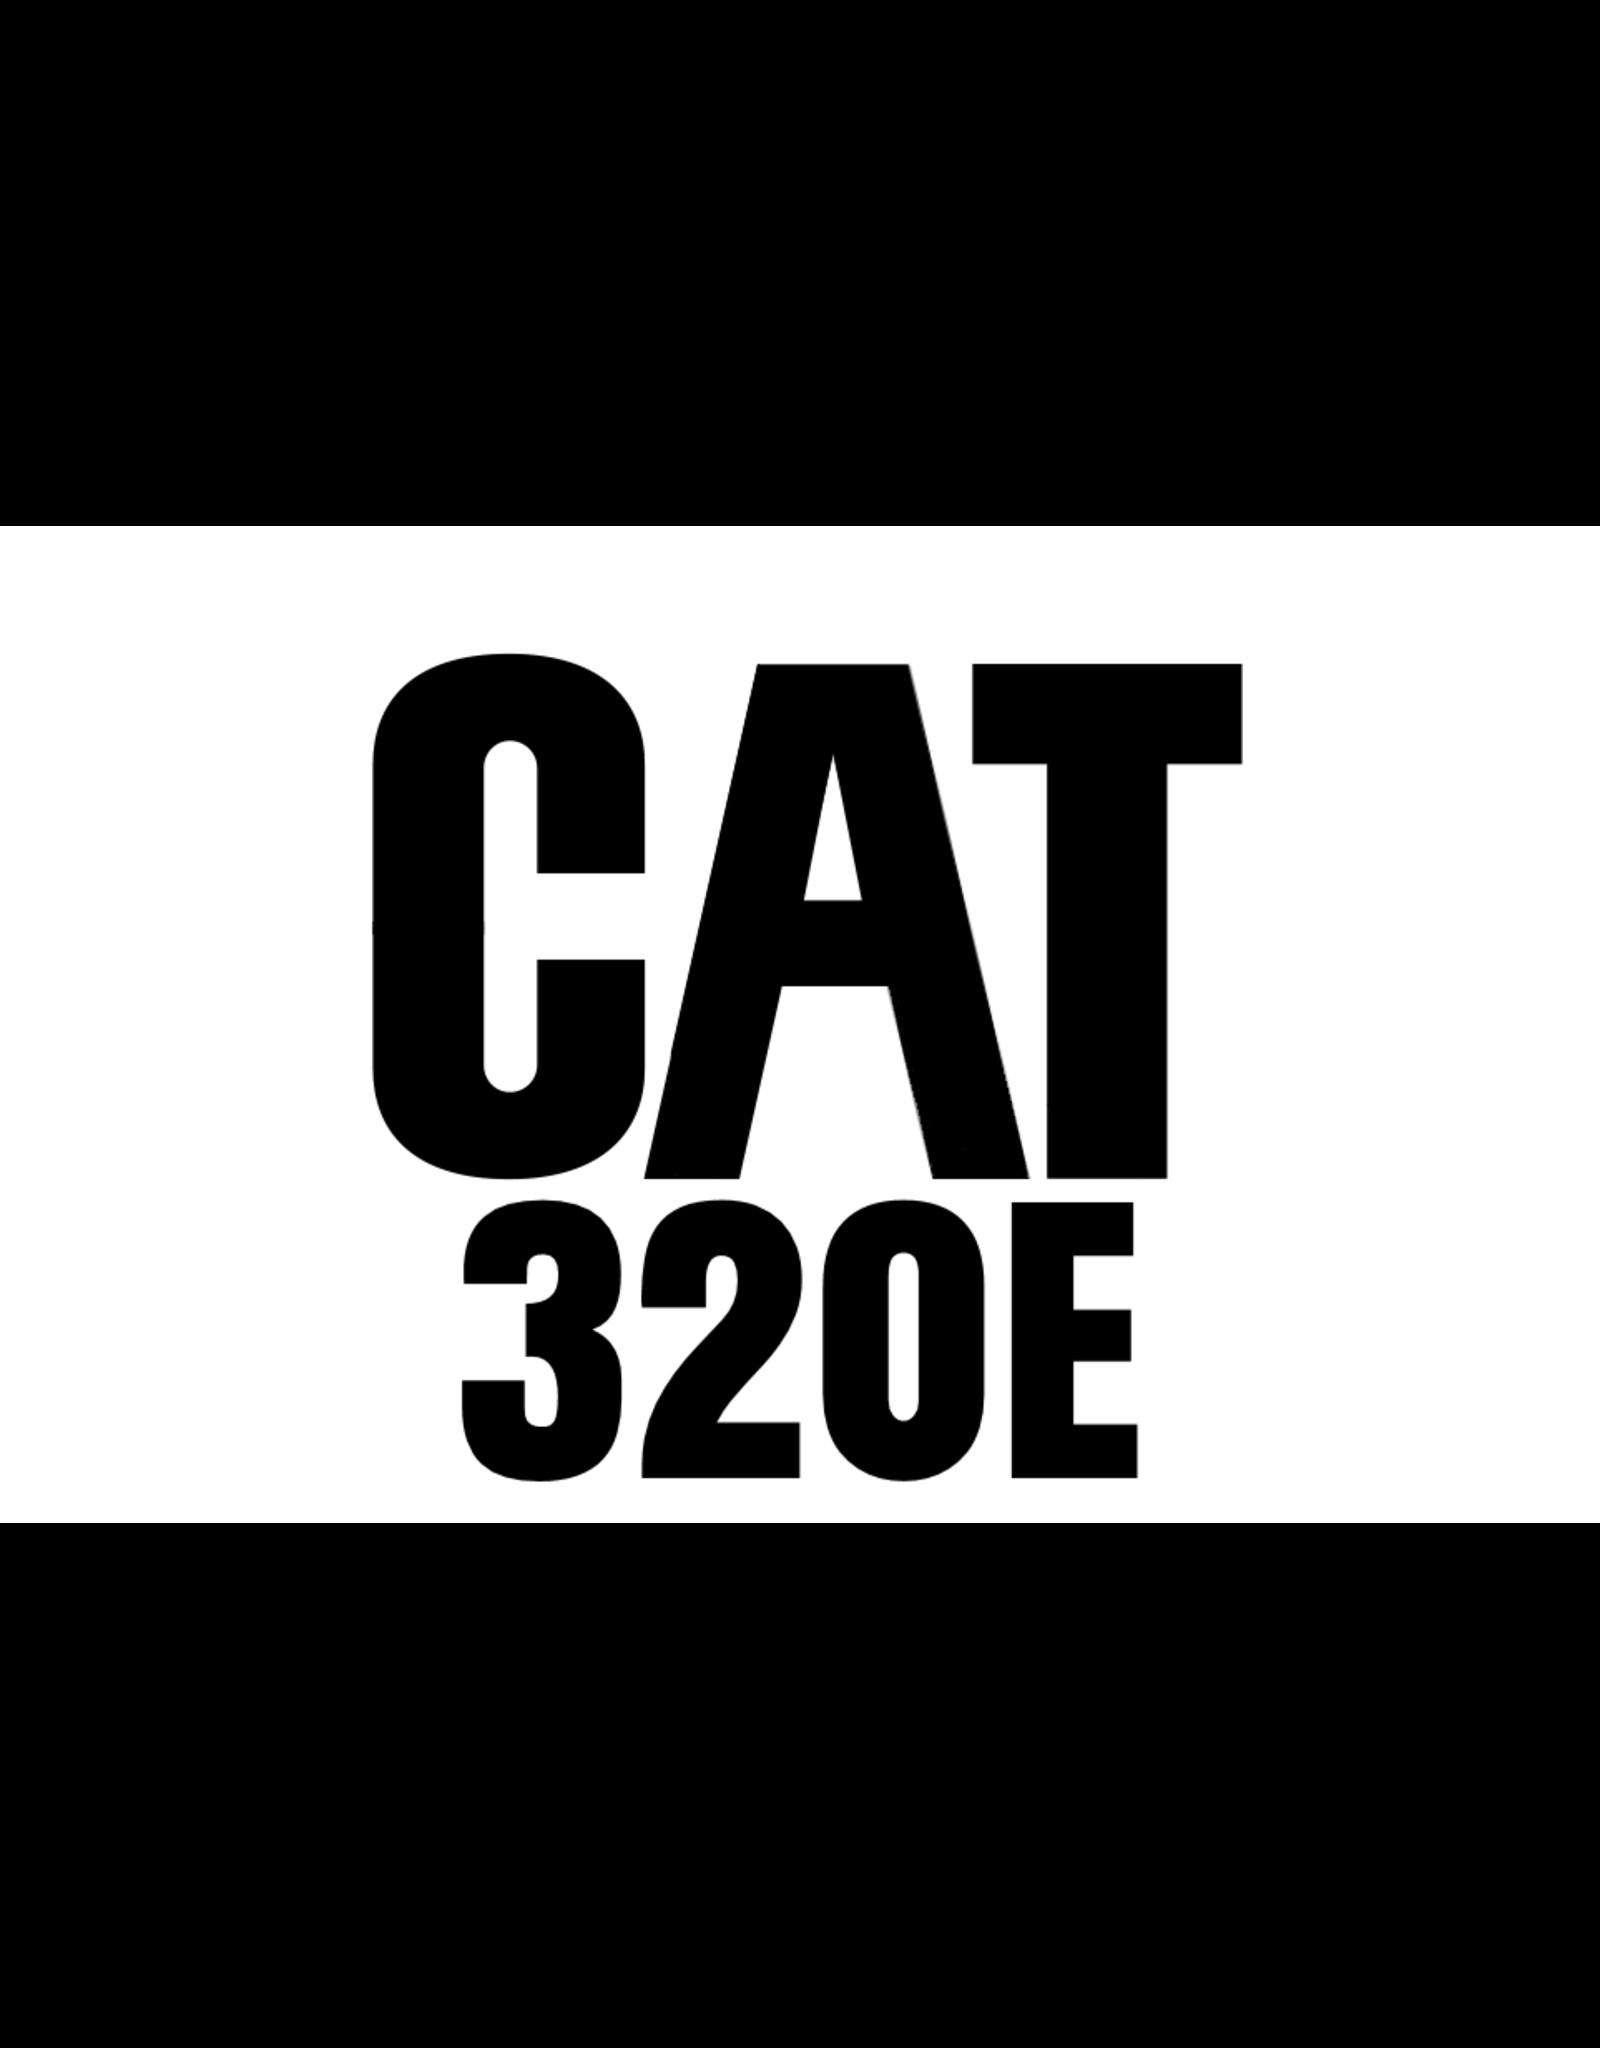 Echle Hartstahl GmbH FOPS für CAT 320E